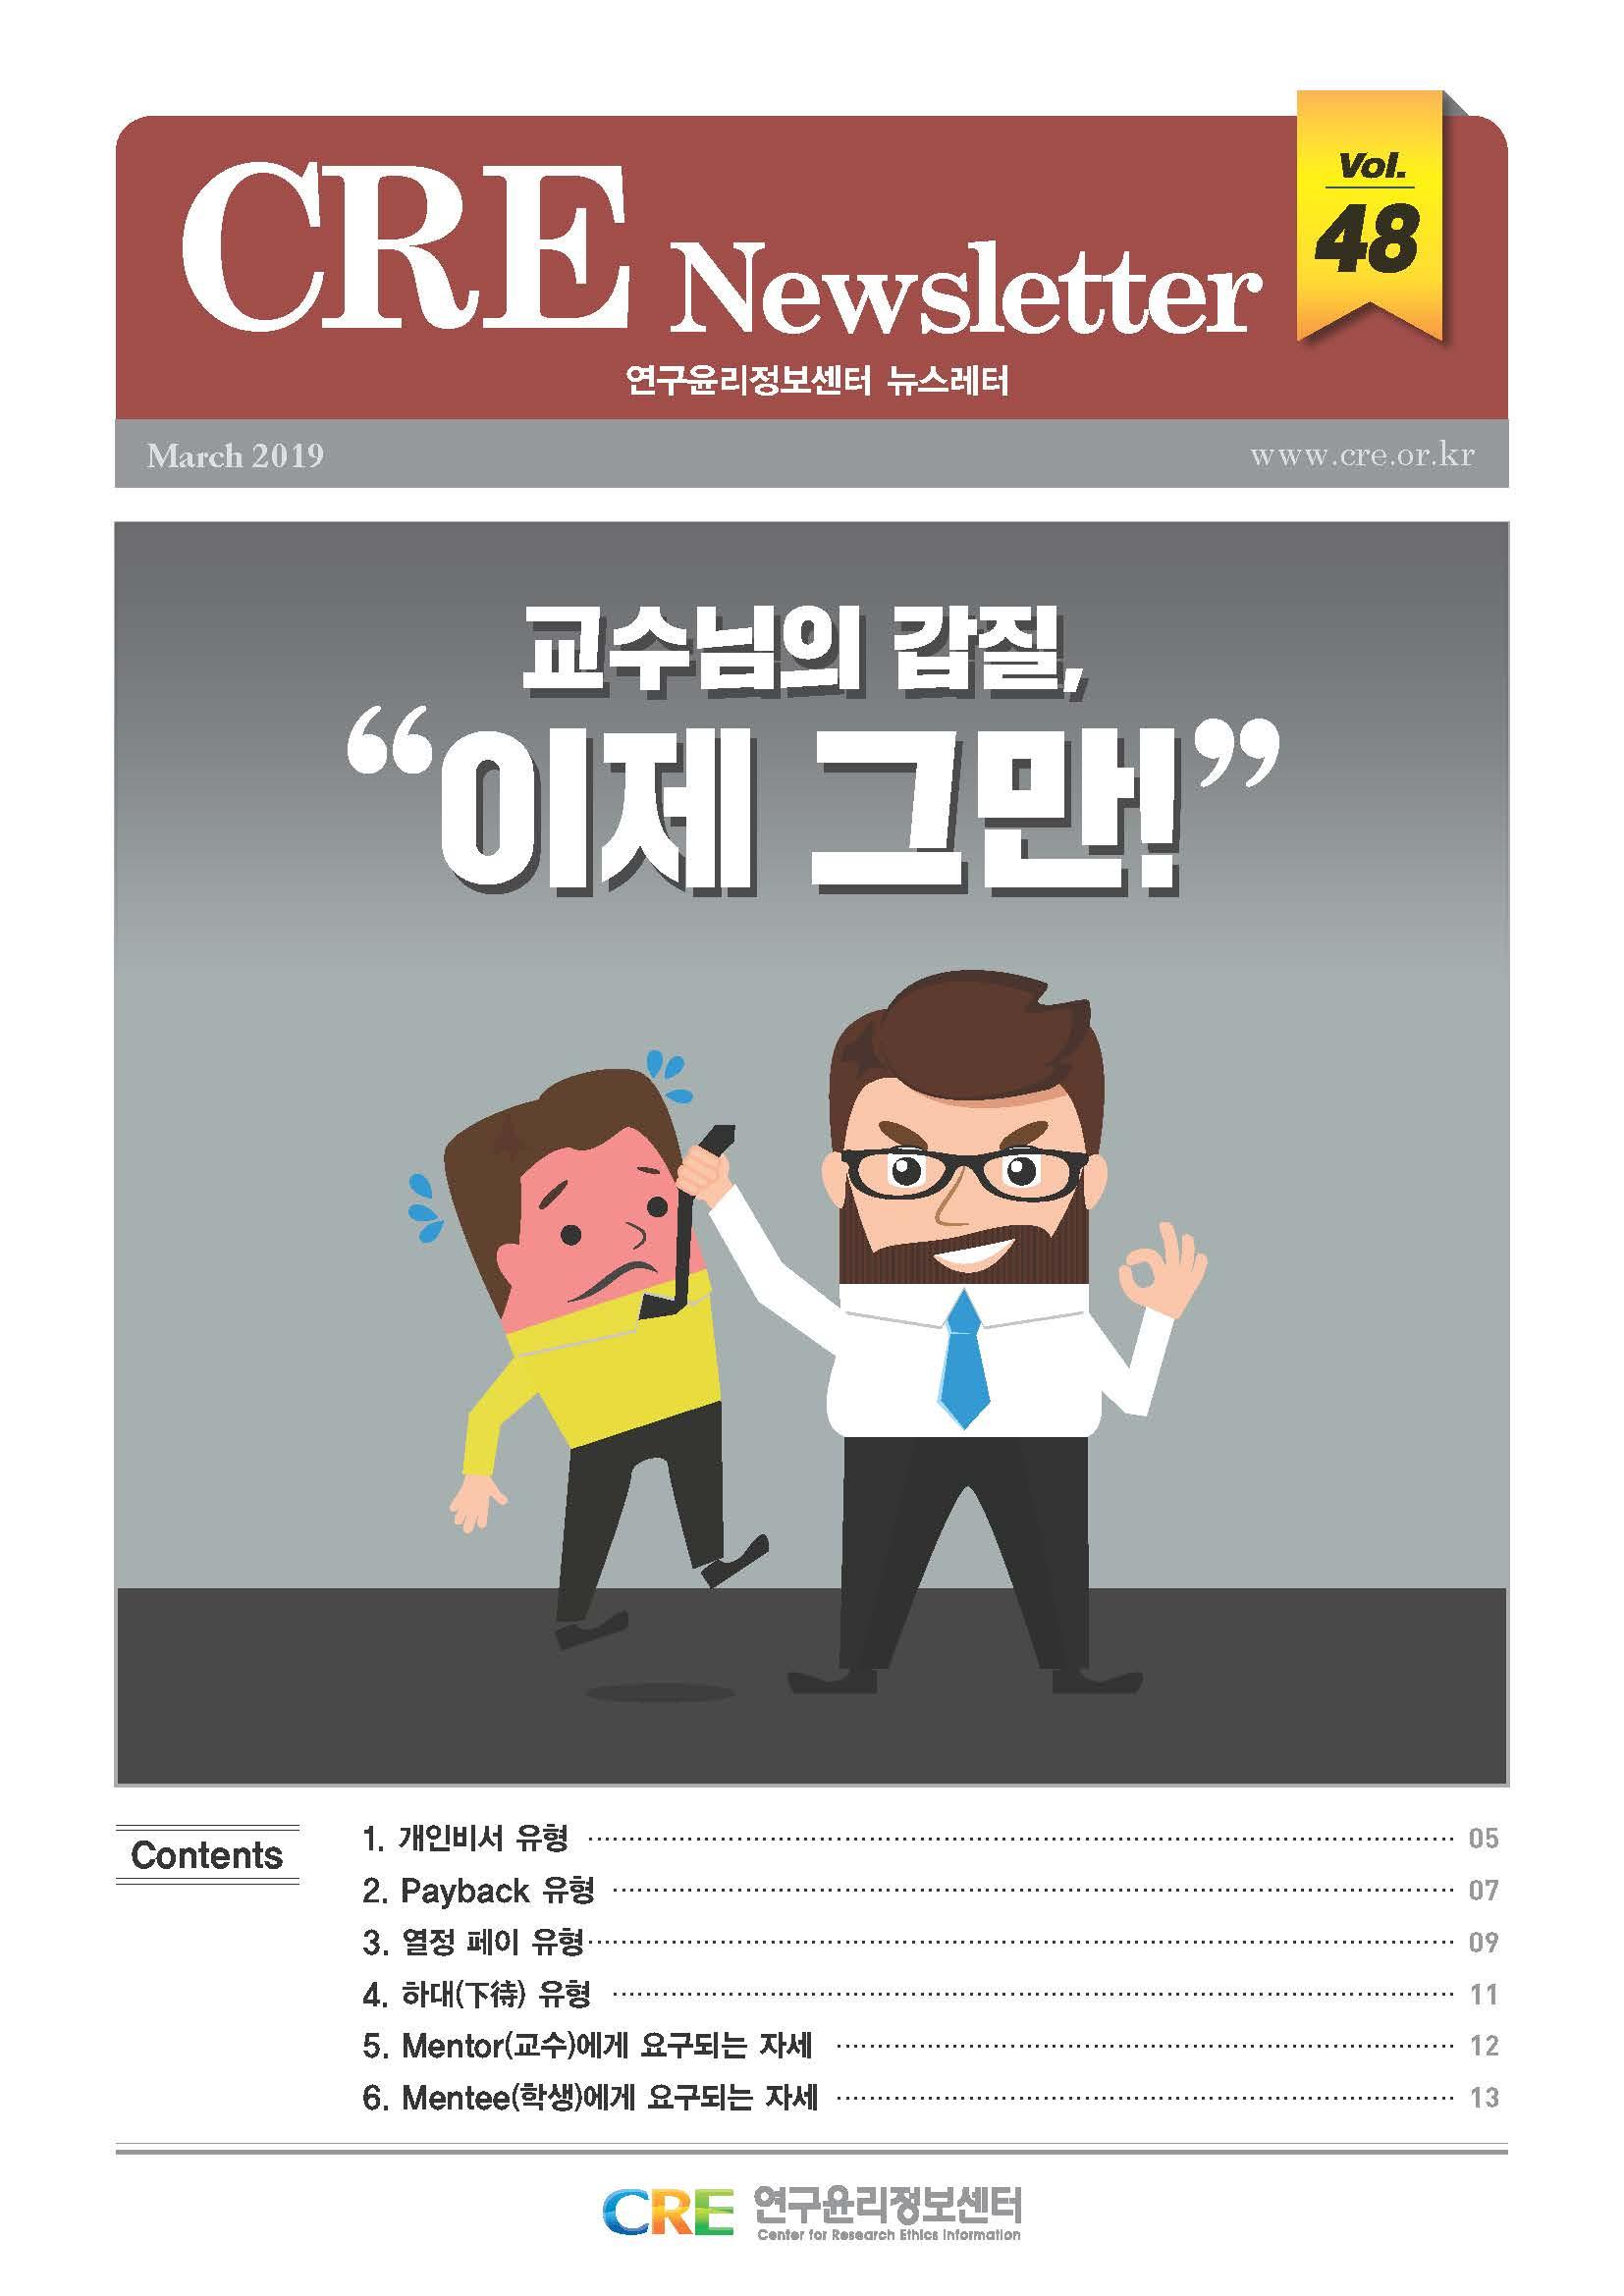 [CRE Newsleeter Vol.48] 연구윤리정보센터 뉴스레터_교수님의 갑질 이제 그만_페이지_1.jpg